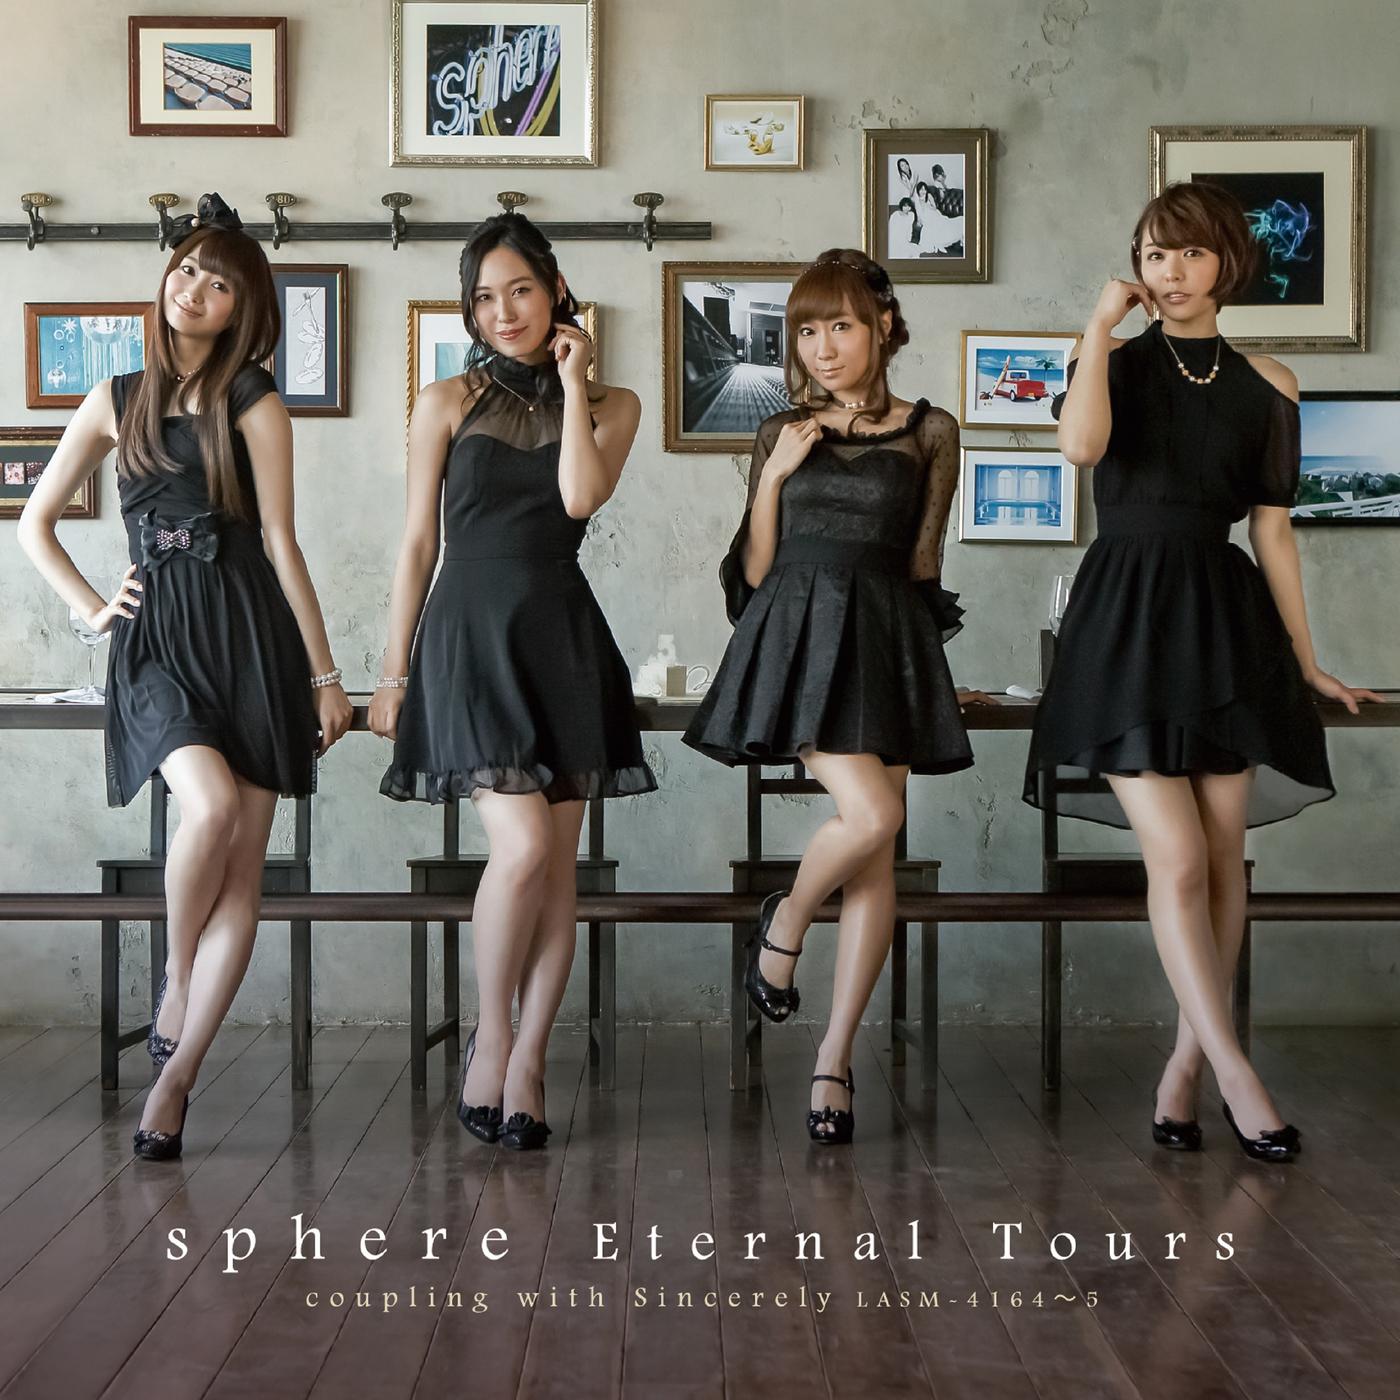 Eternal Tours (Type C) - Sphere